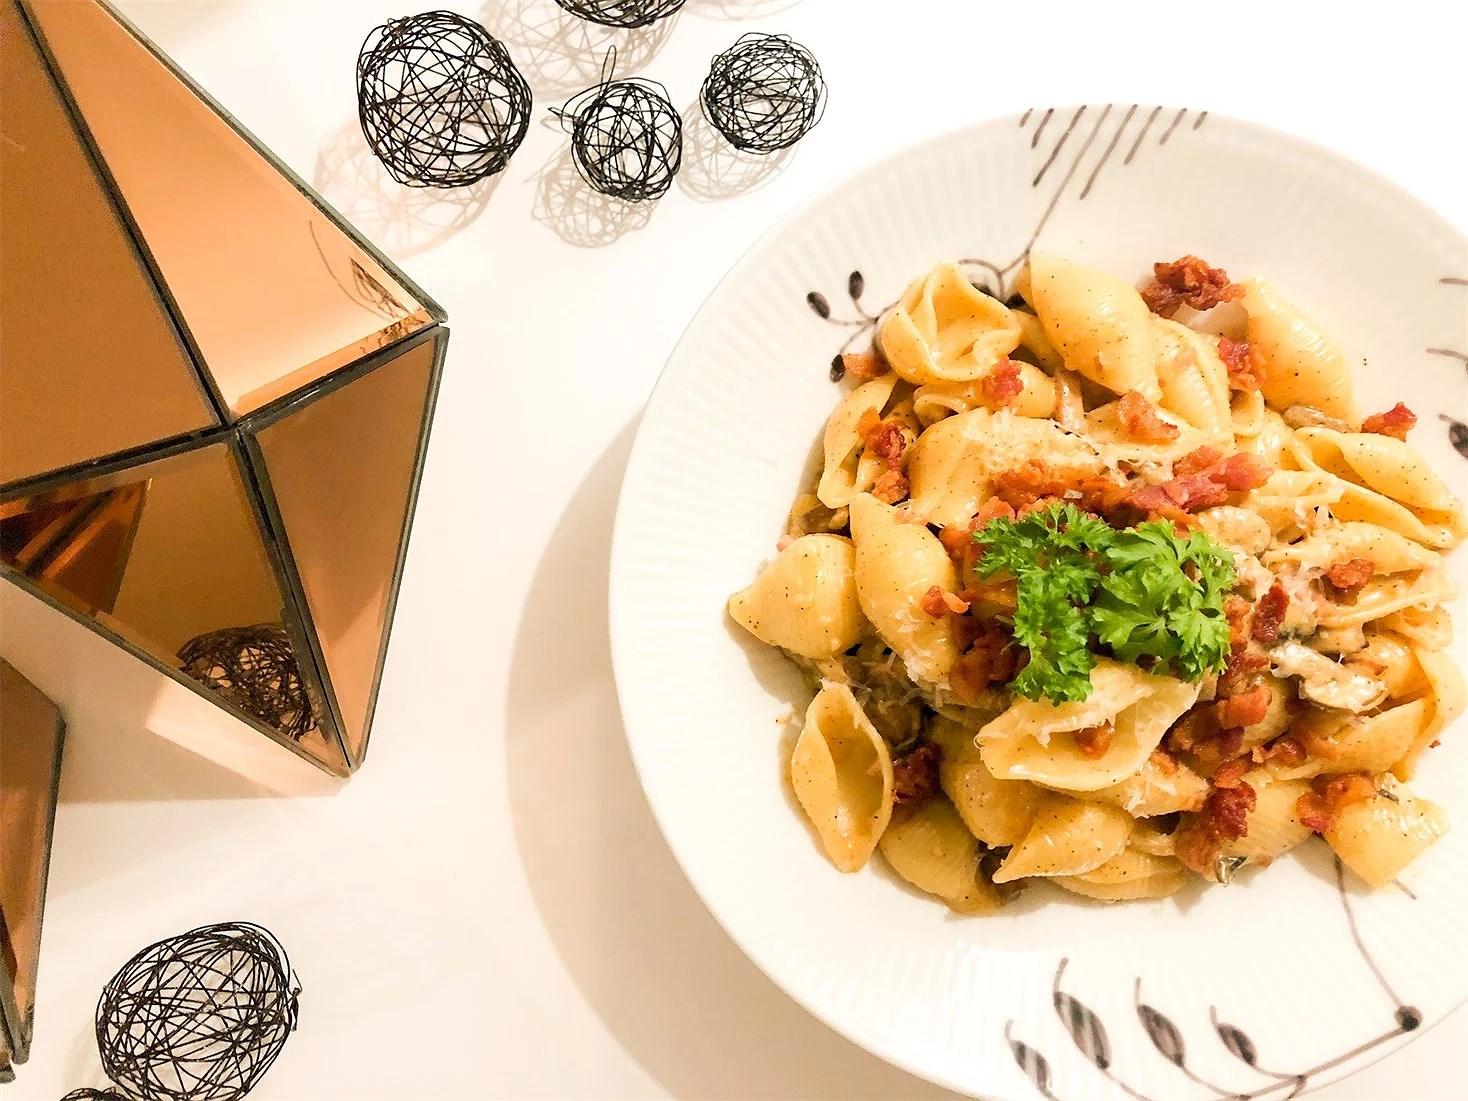 Pasta dream with mushrooms, cream and bacon